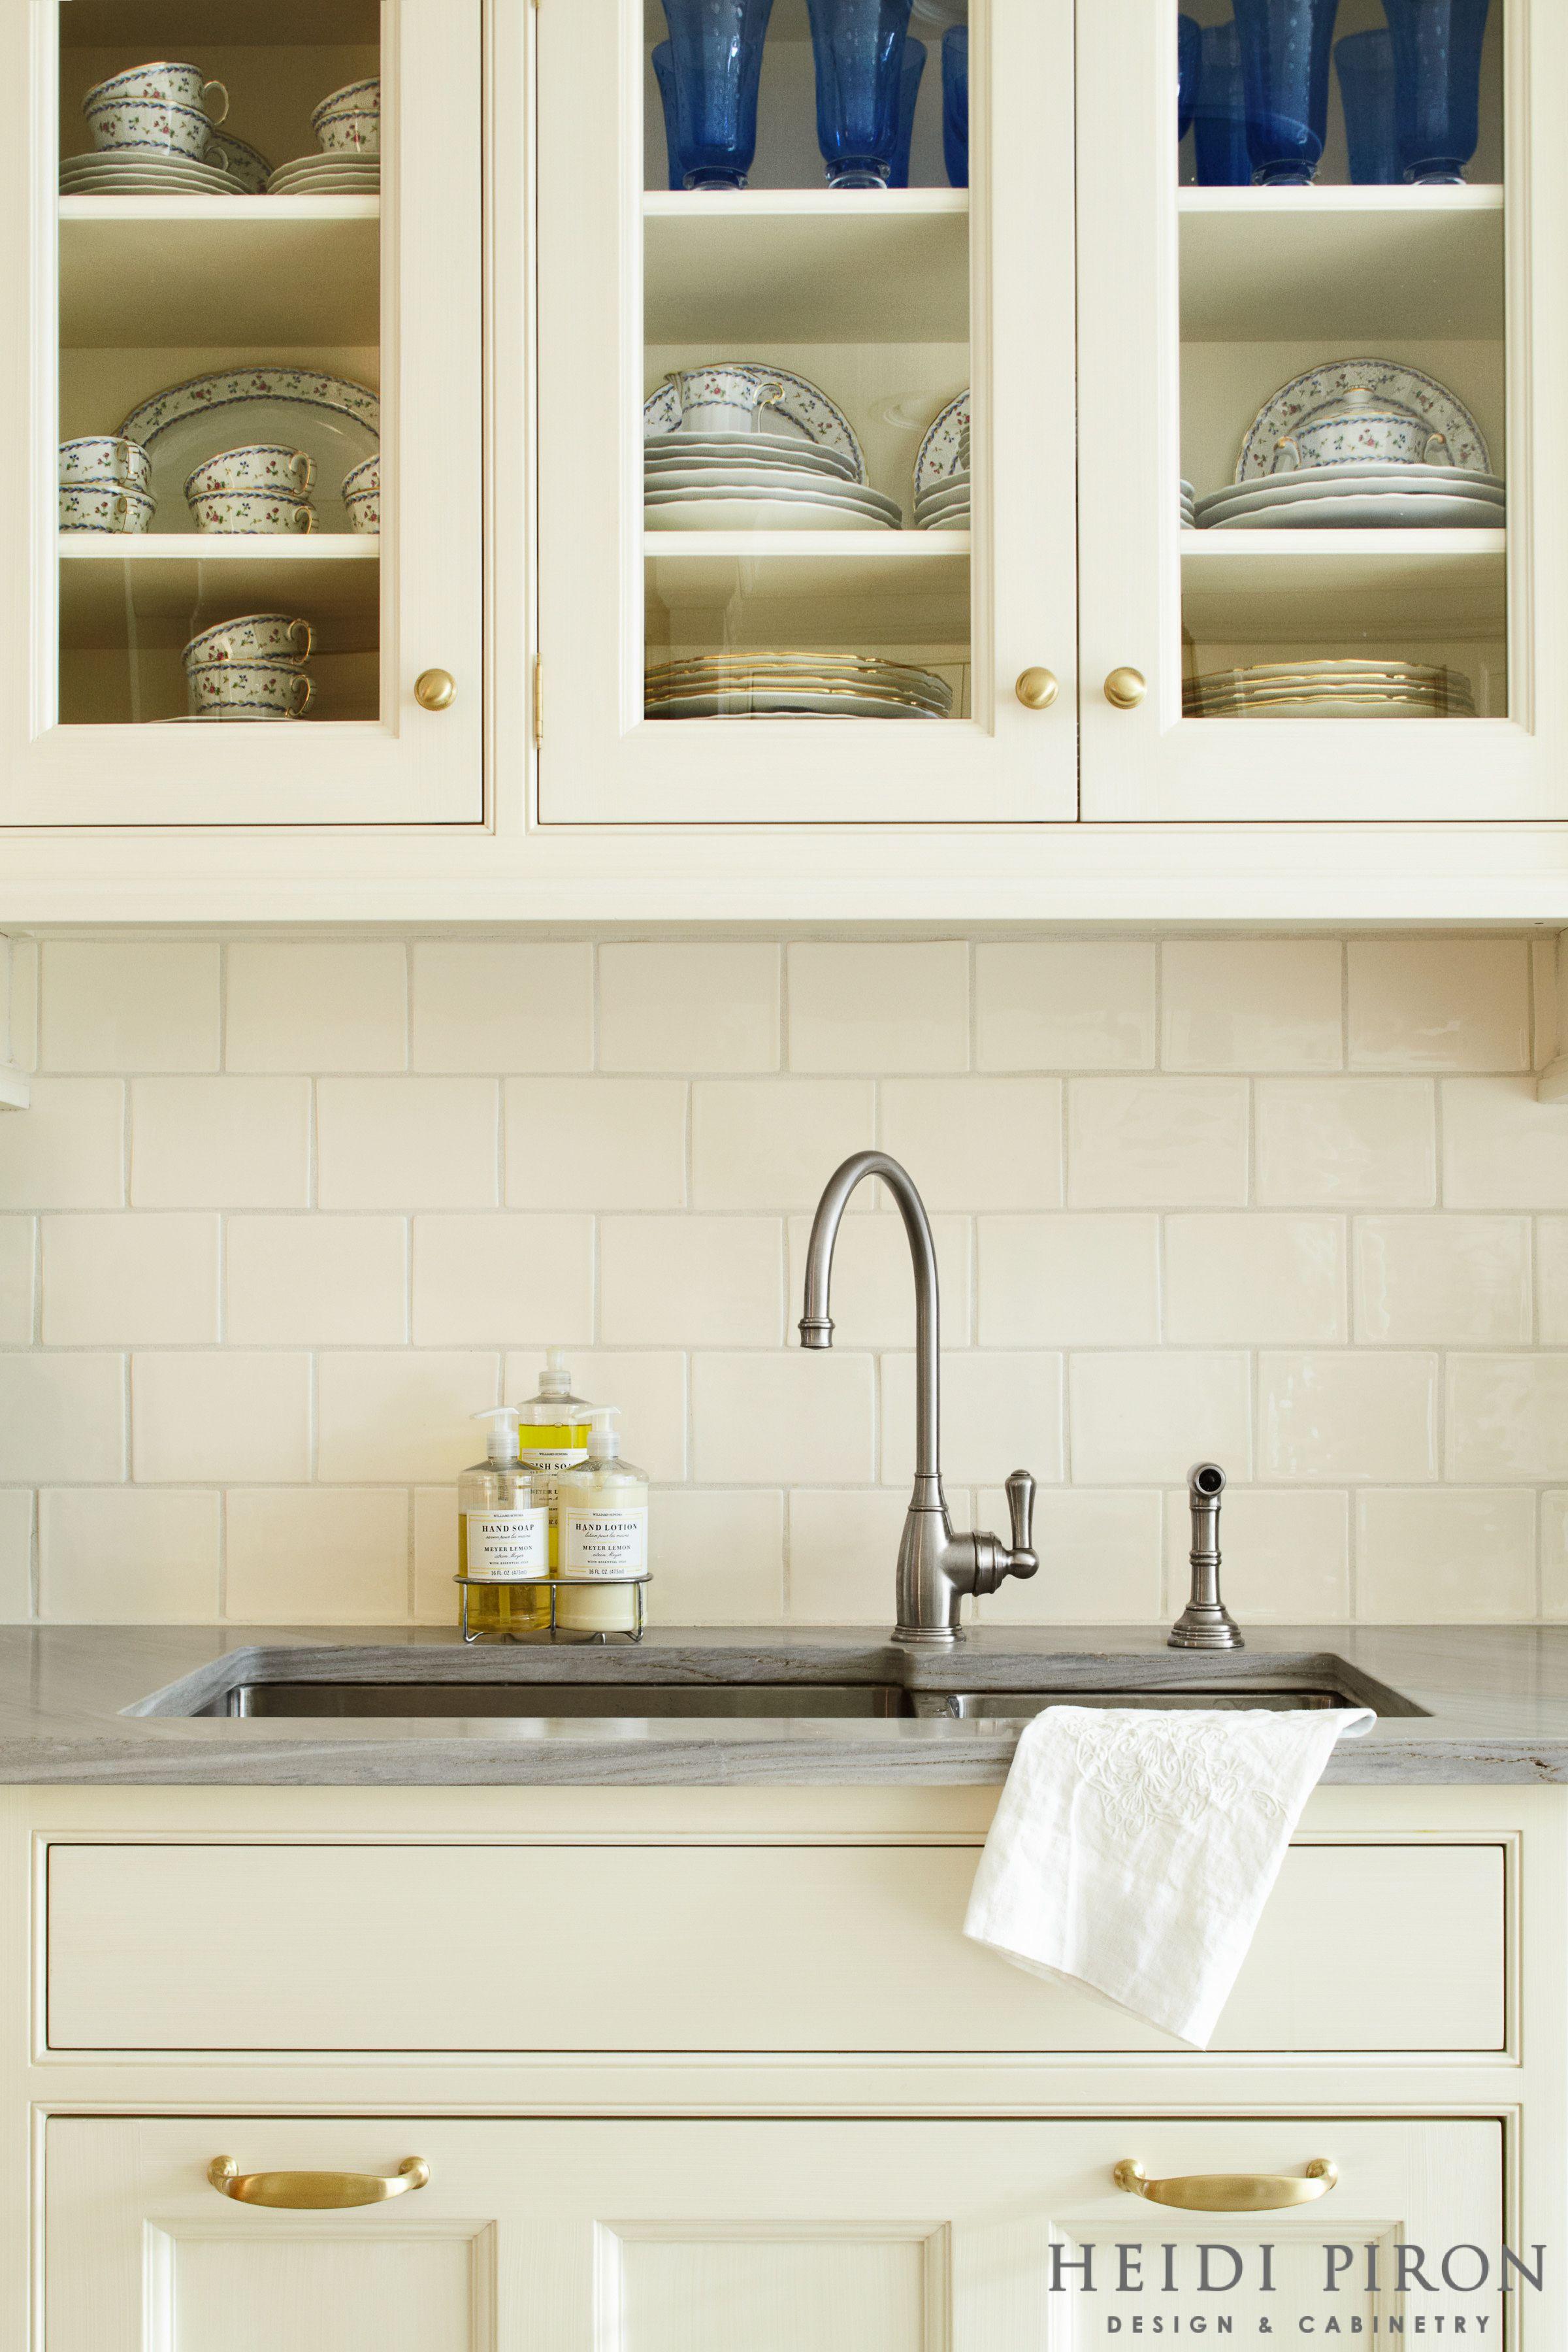 Award Winning Kitchen Designer Heidi Piron Creates Hand Crafted Kitchens And Customized Spaces From Trad Kitchen Hardware Off White Kitchens Kitchen Design